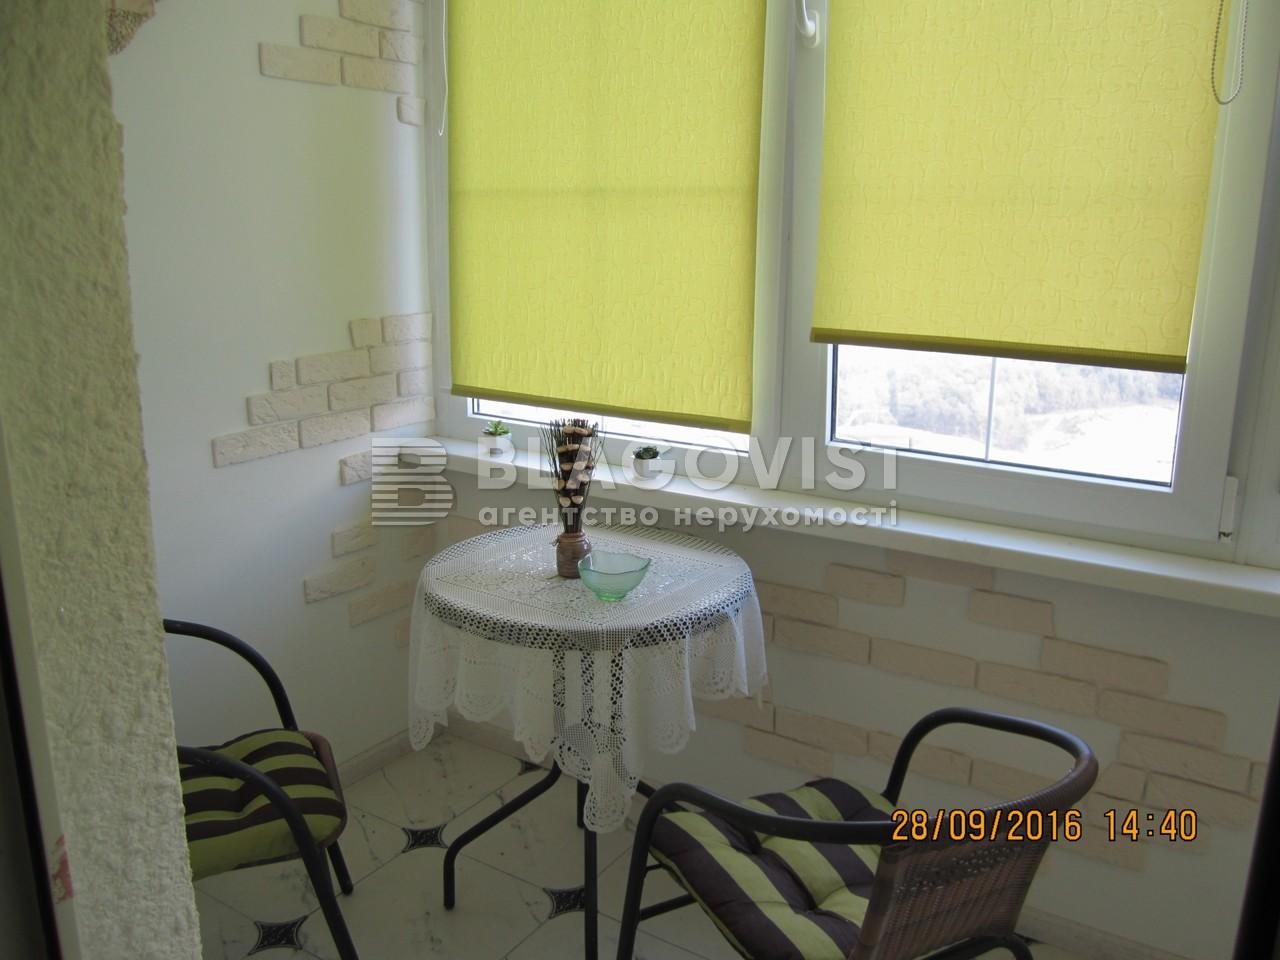 Квартира Z-1755816, Чавдар Елизаветы, 28, Киев - Фото 15